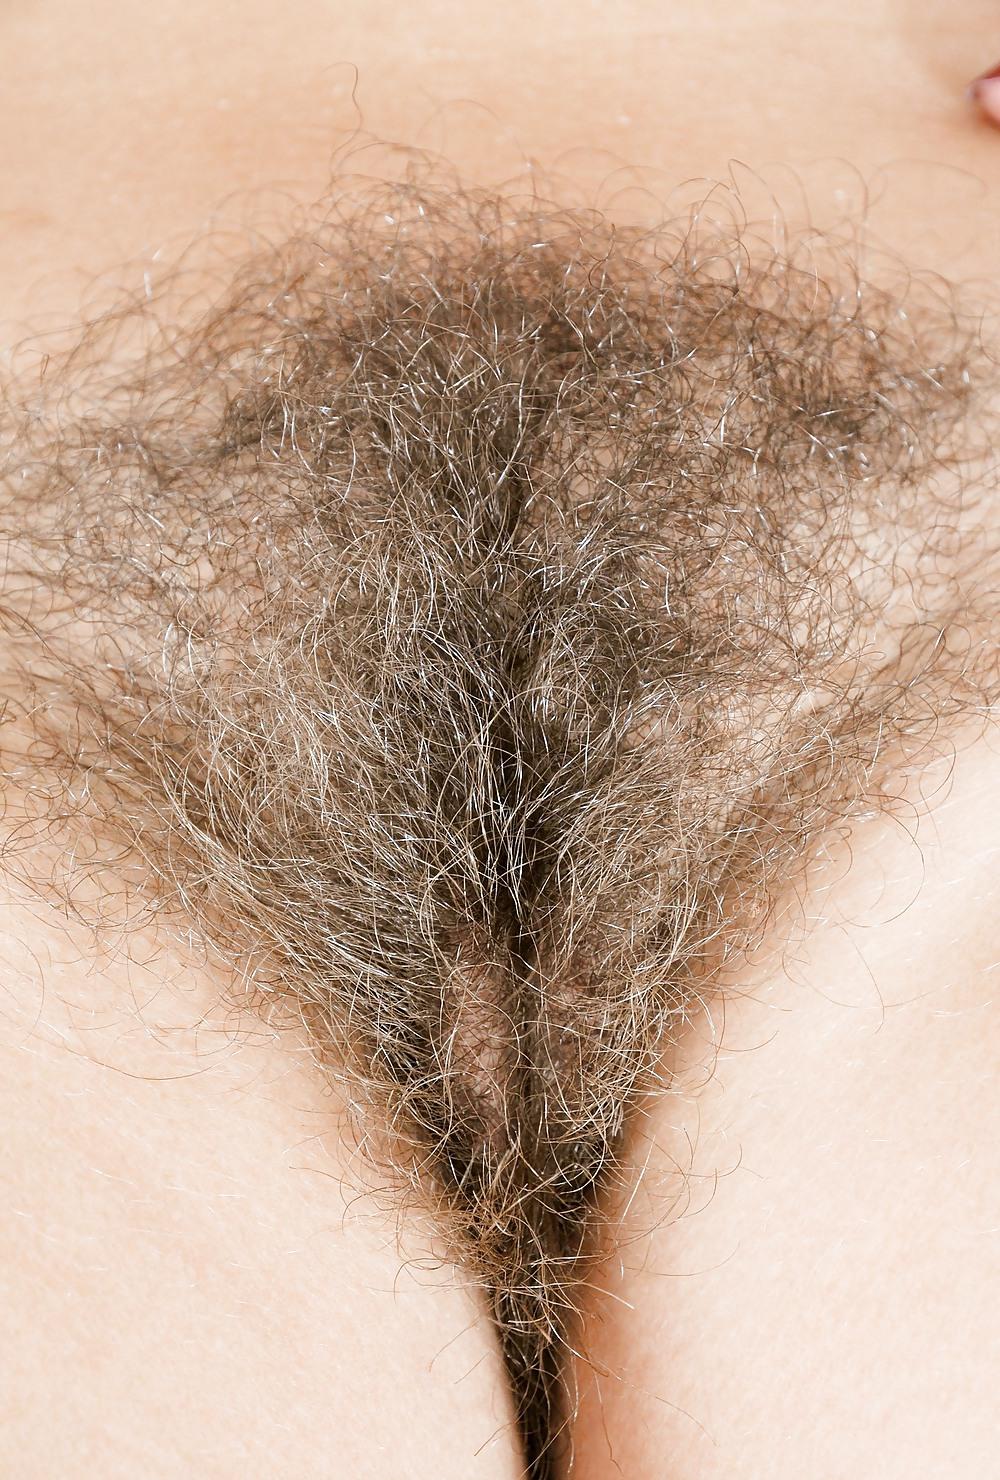 Gray hair women spread